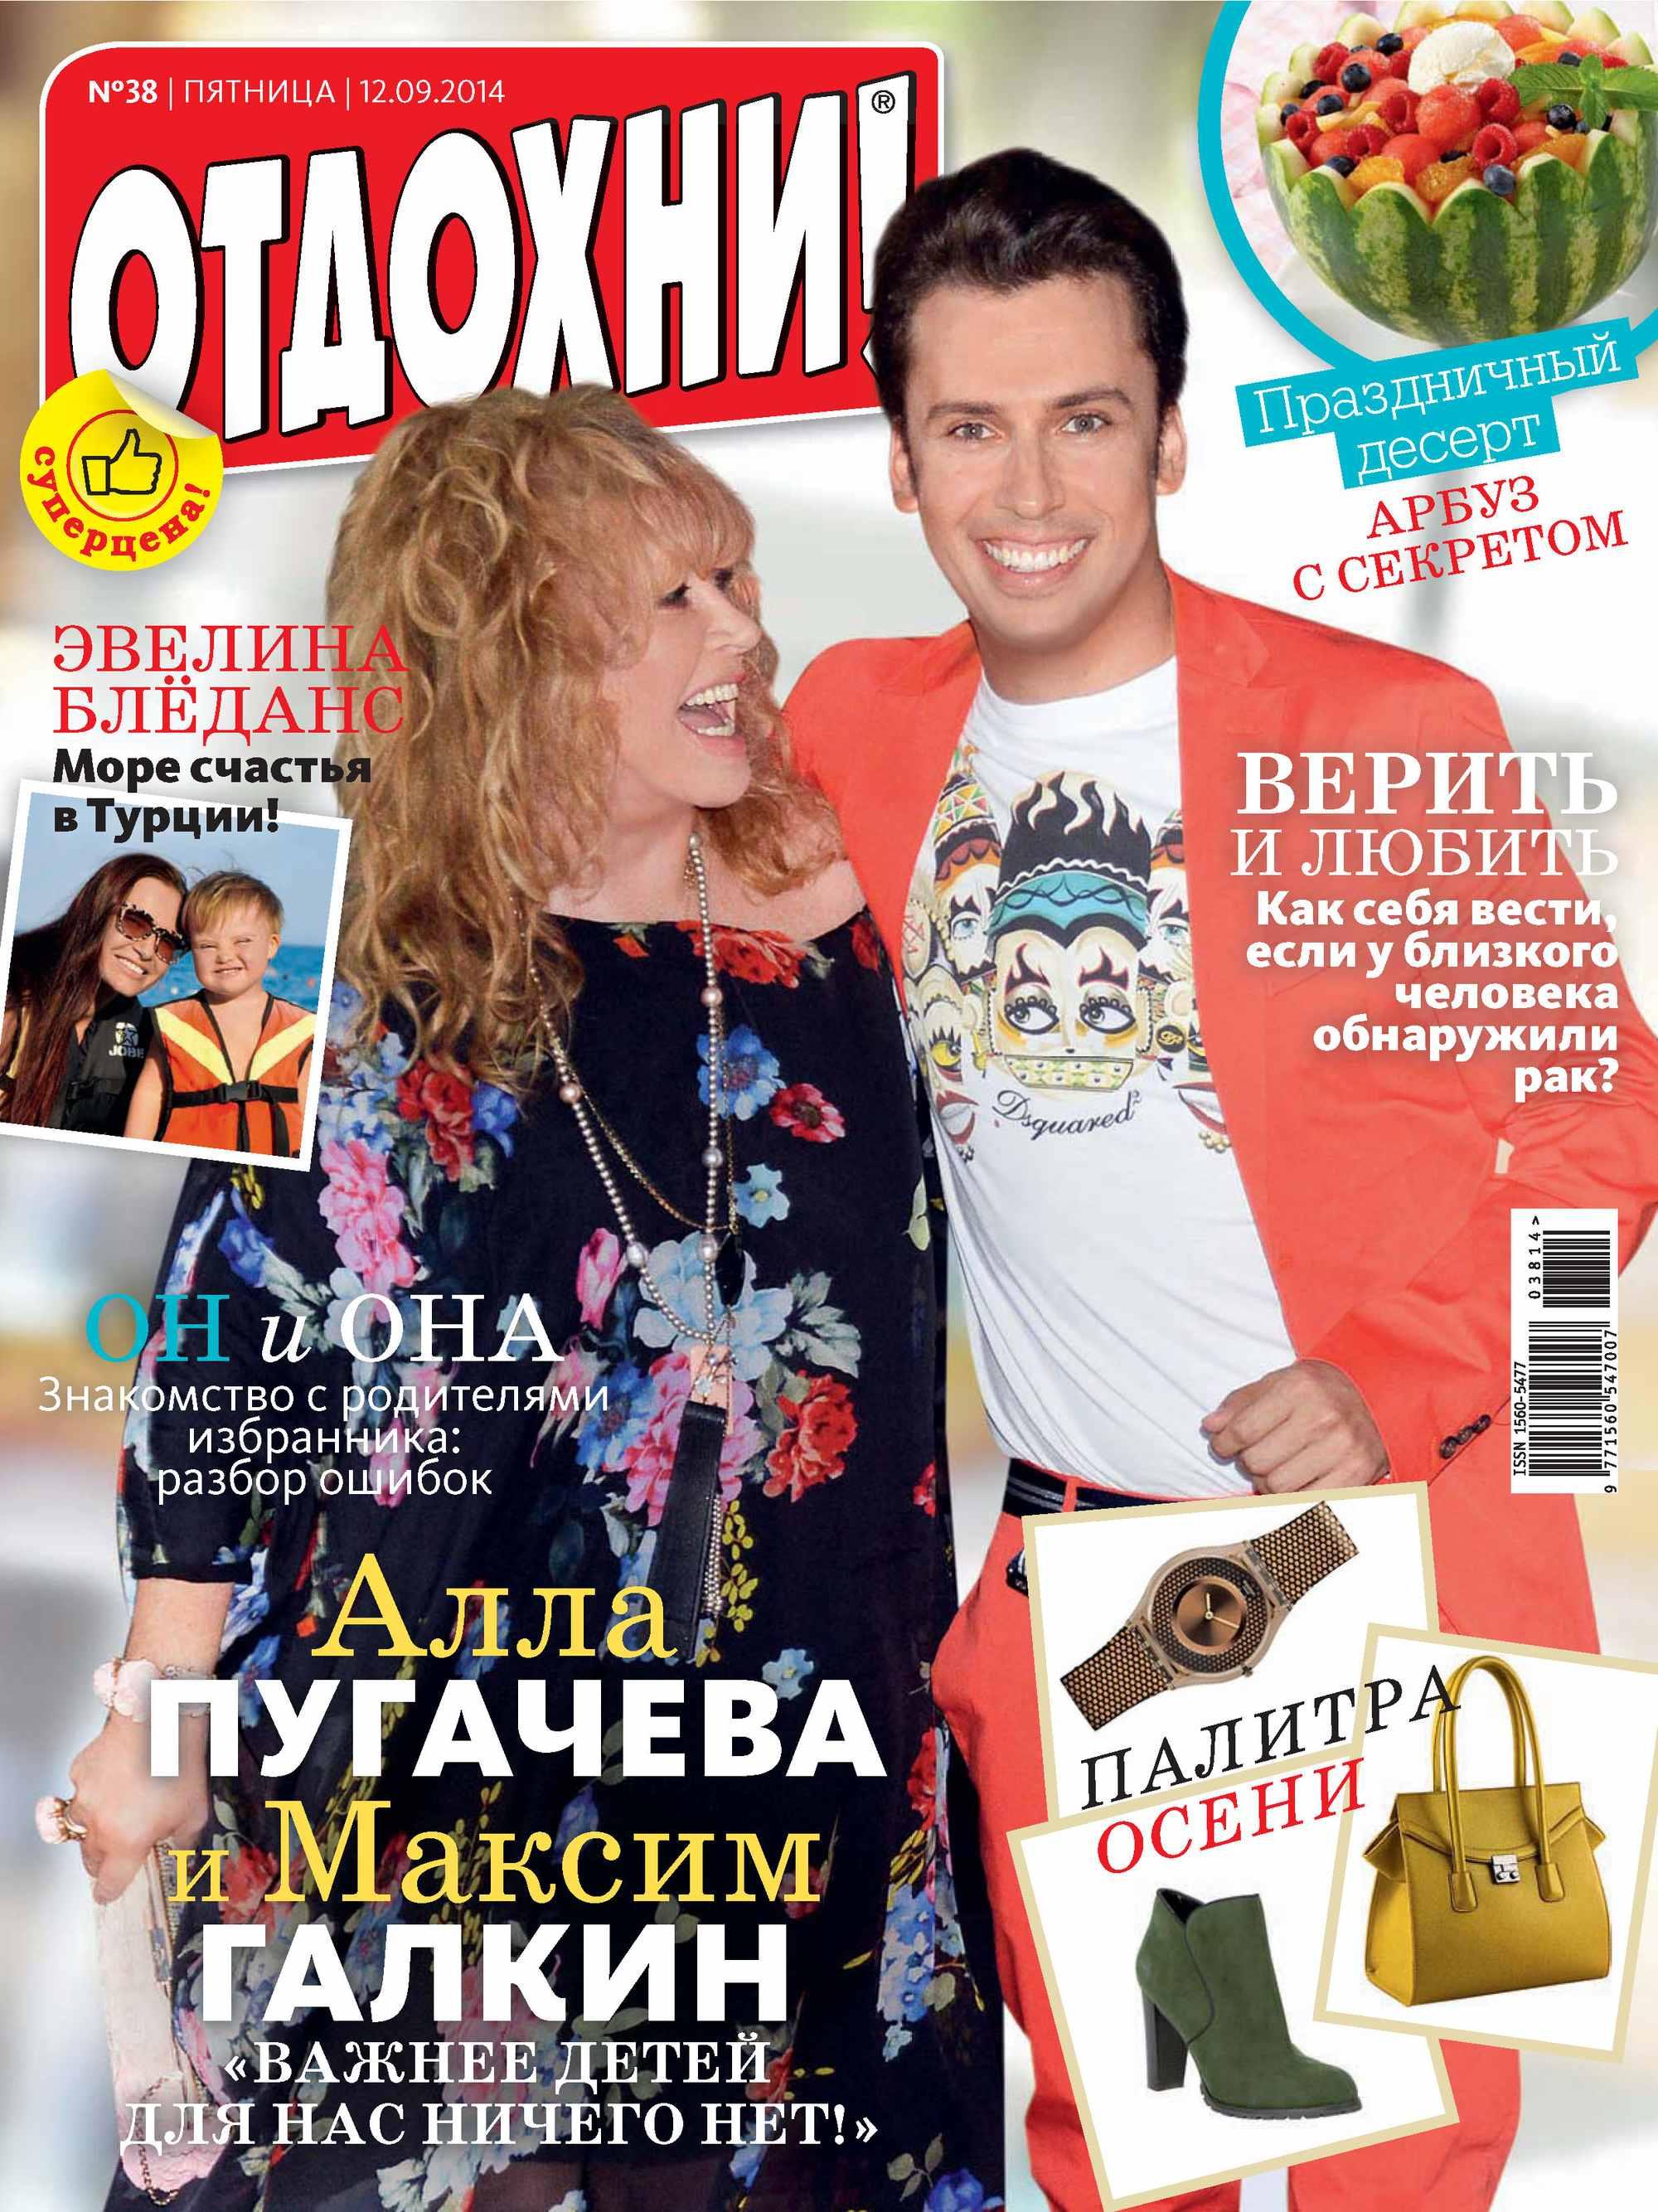 ИД «Бурда» Журнал «Отдохни!» №38/2014 ид бурда журнал лиза 38 2014